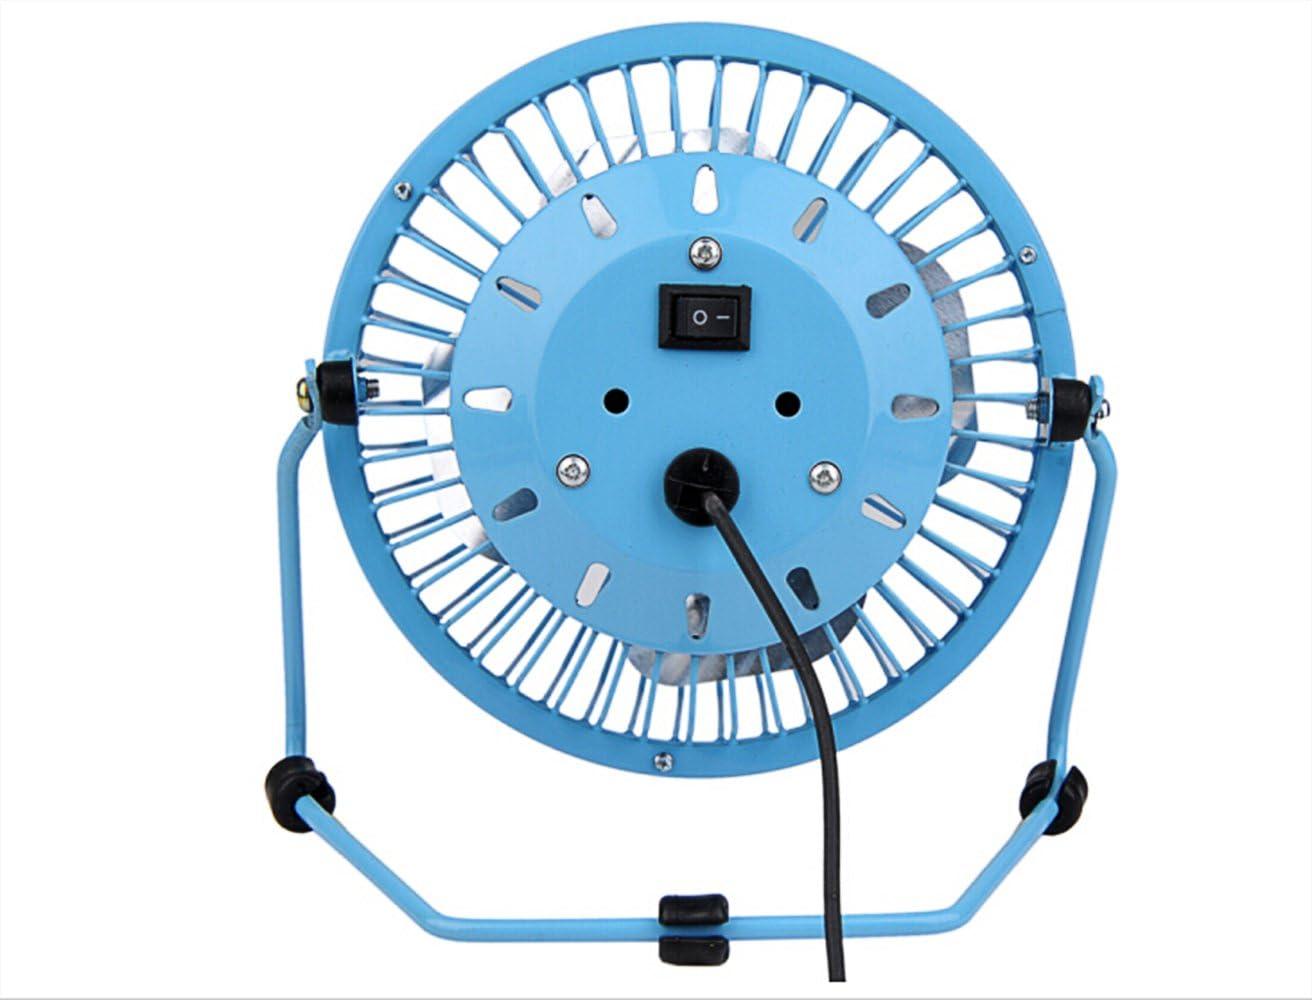 Metal Mini Protable PC Laptop USB Fan 360 Degree Rotation Ultra-quiet Summer Home Office Desk Electric Cooling Fan